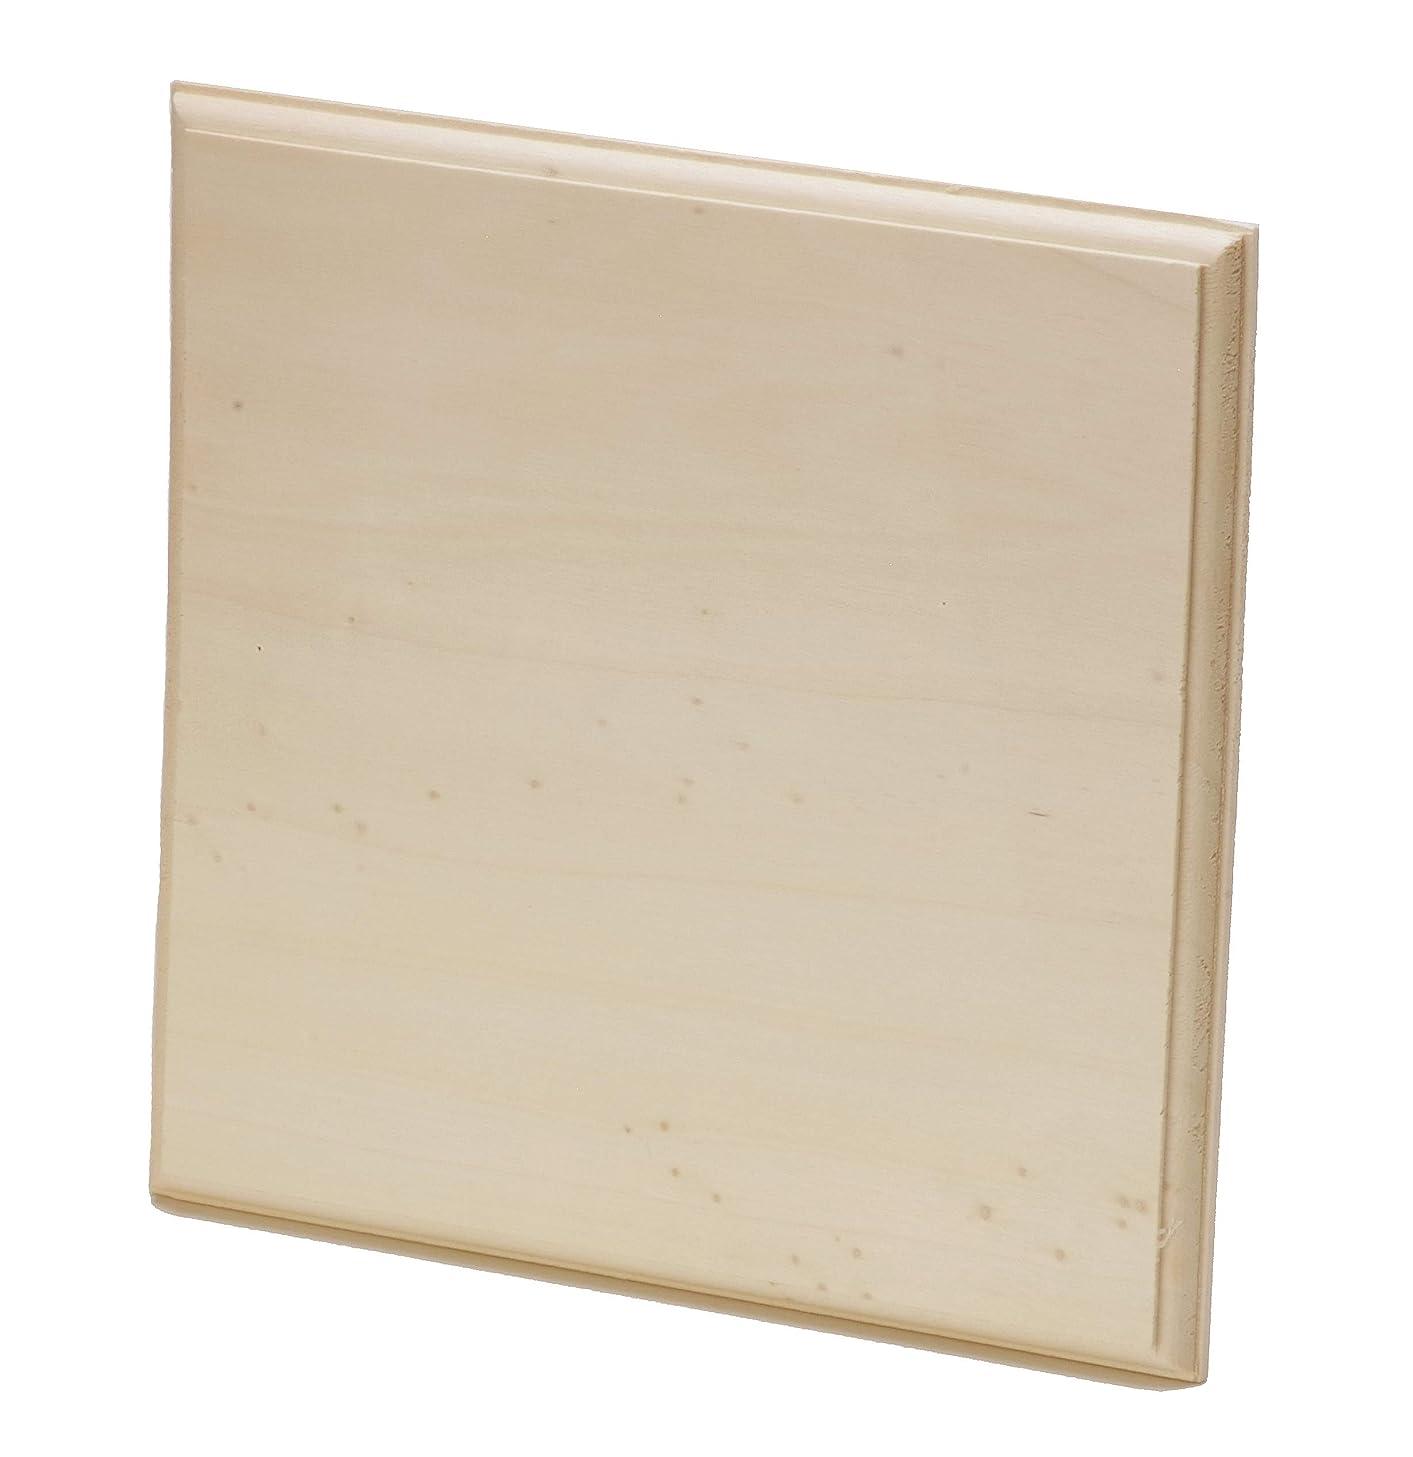 DARICE 9190-133 Wood Plaque Unfin AST, Multicolor